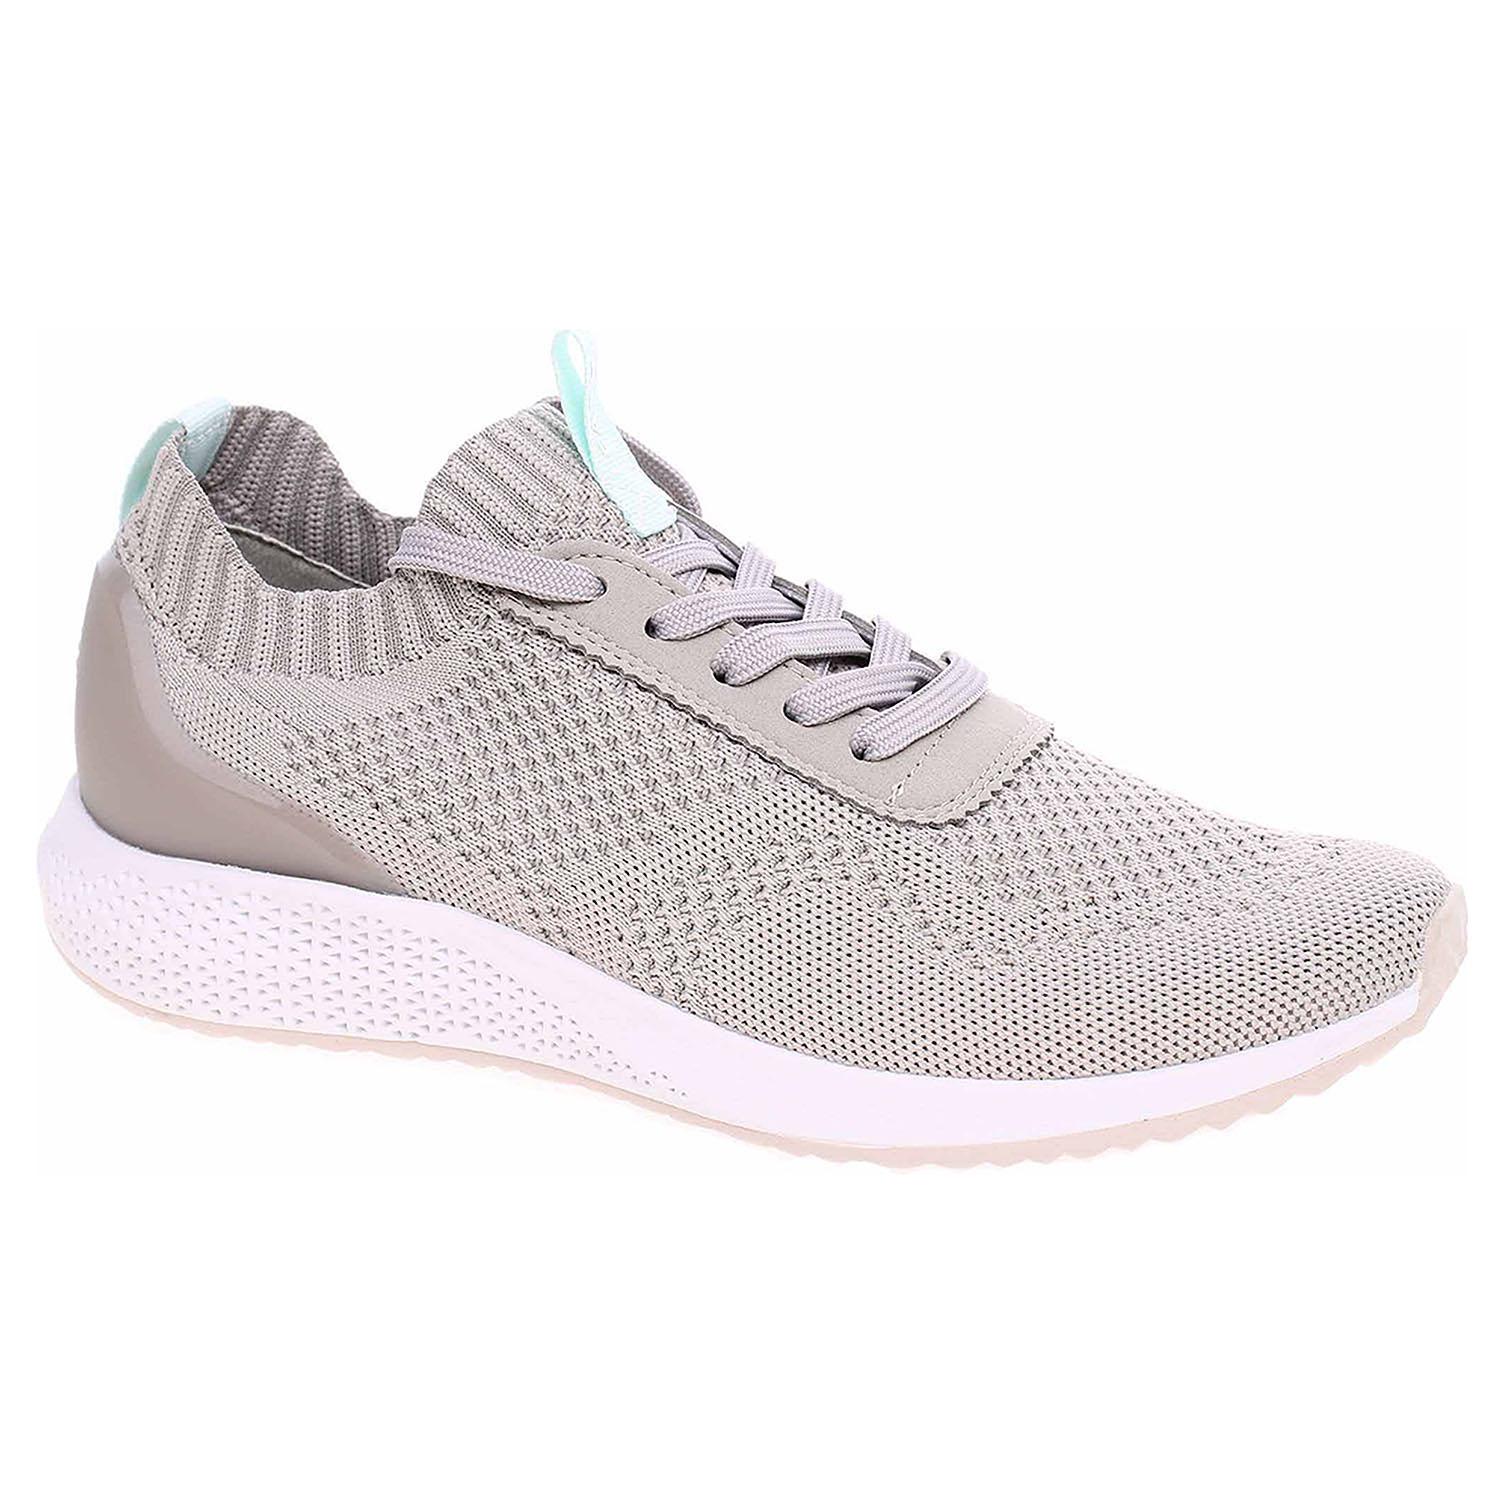 Dámská obuv Tamaris 1-23714-22 stone 1-1-23714-22 205 38